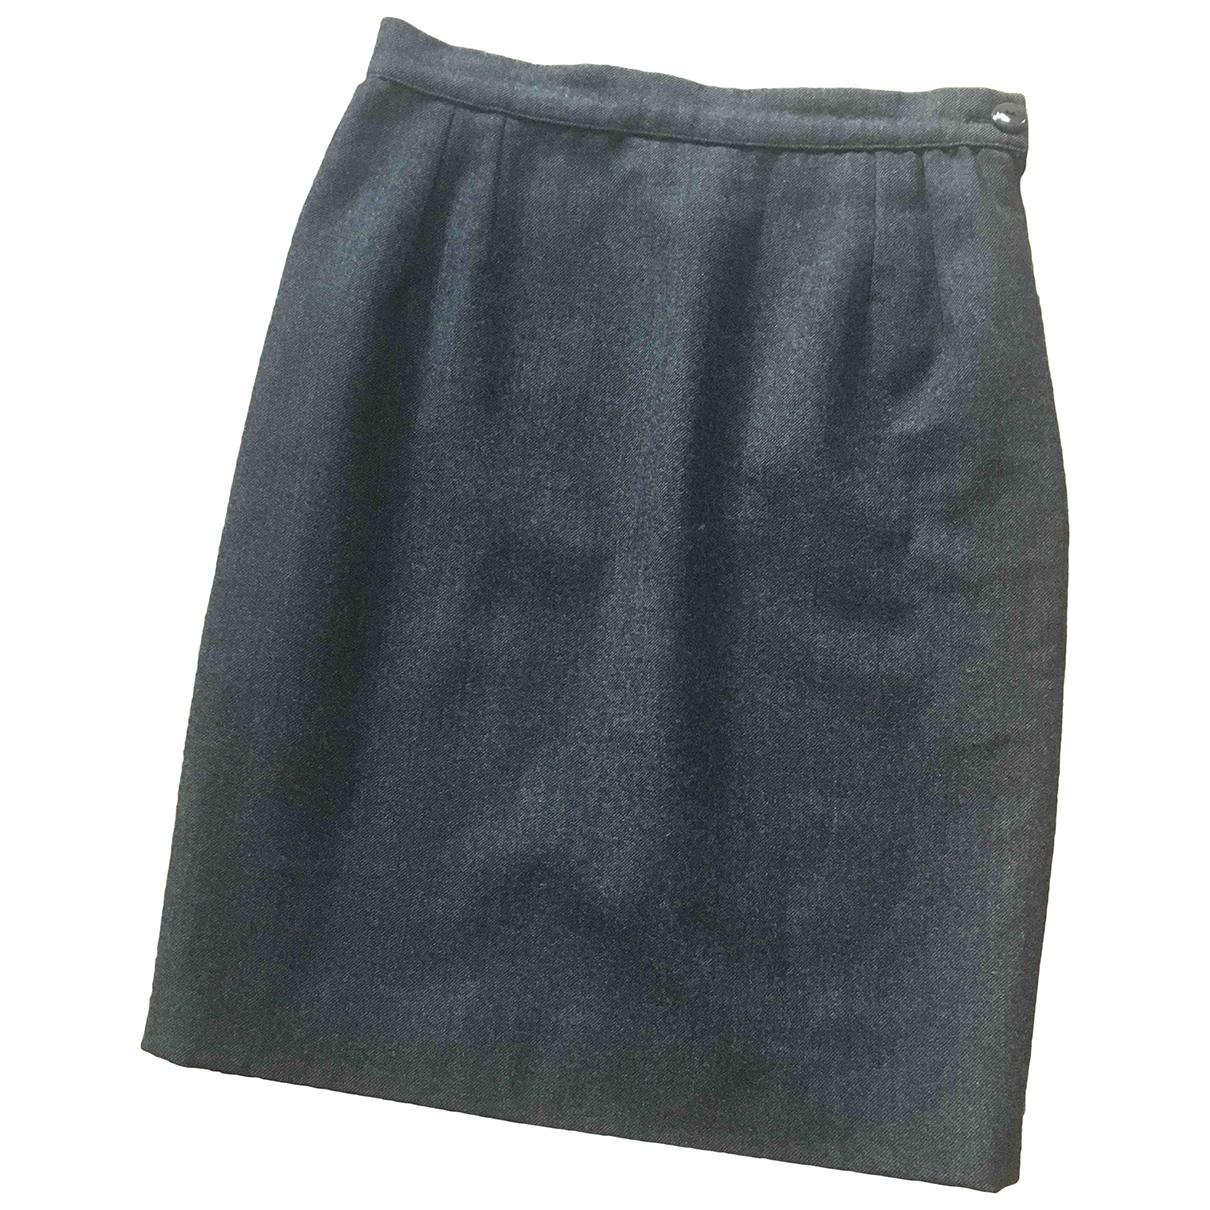 Valentino Garavani \N Anthracite Wool skirt for Women 8 UK